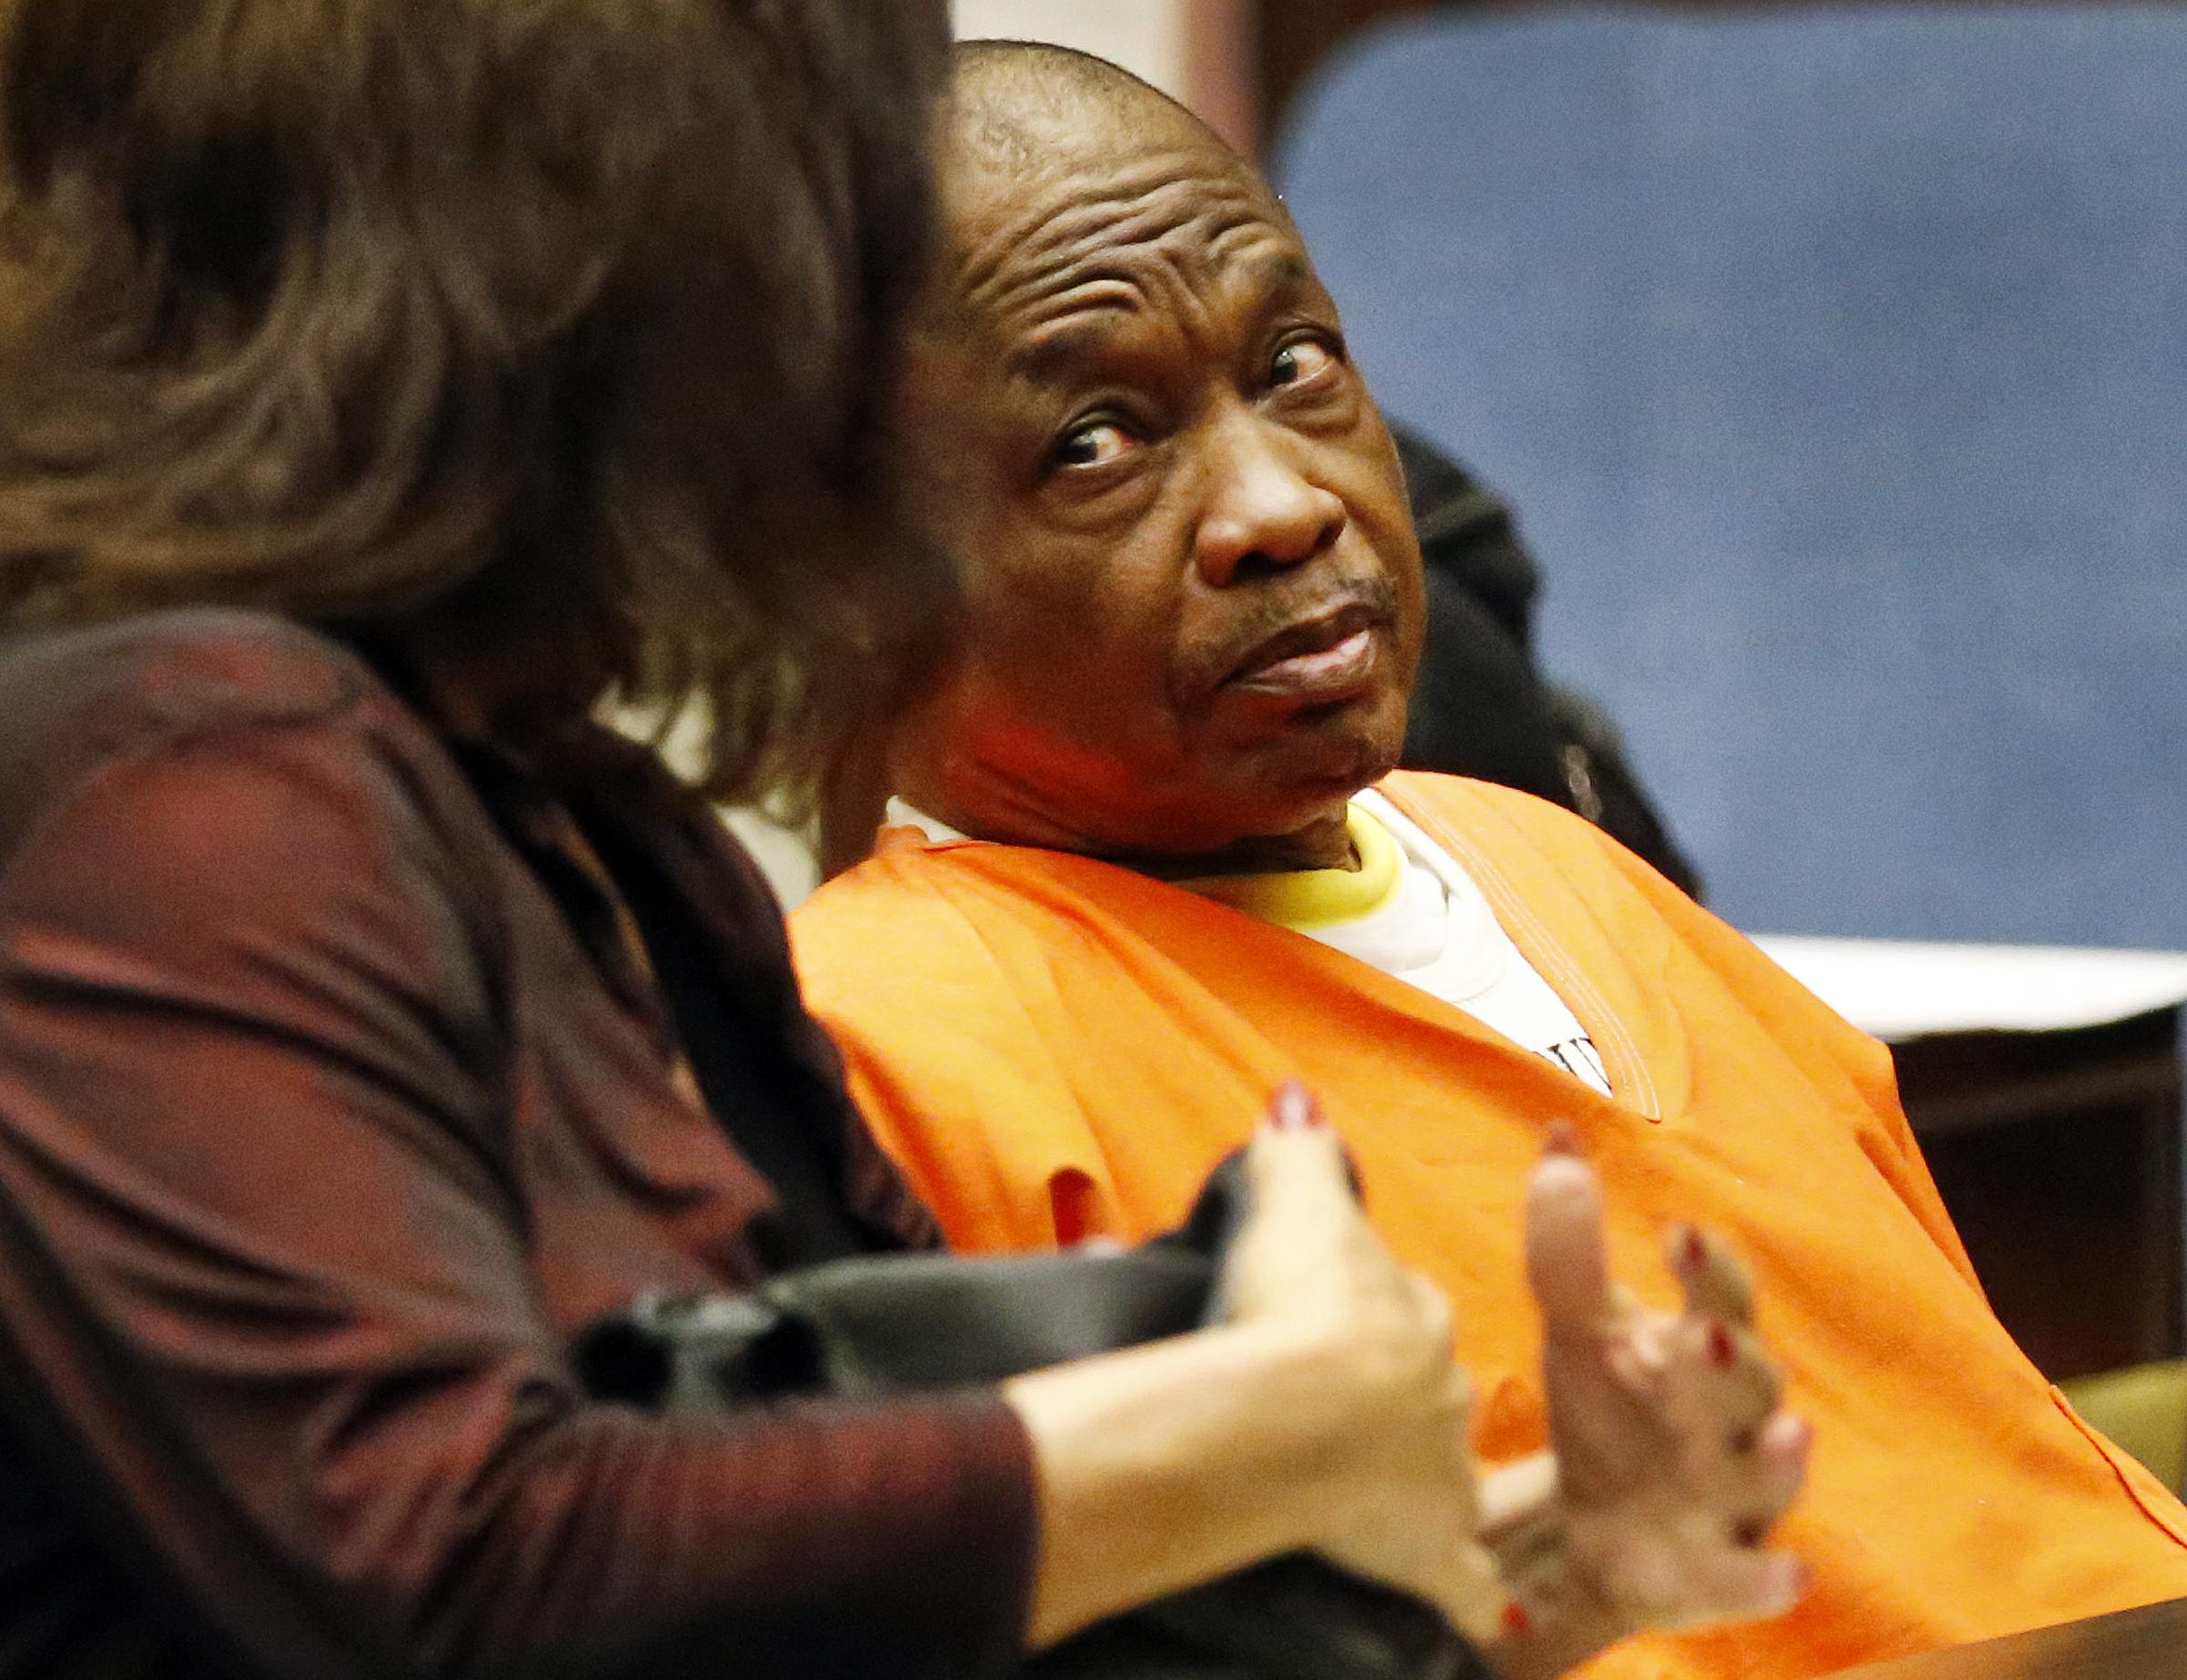 Jury Gives 'Grim Sleeper' Serial Killer A Death Sentence